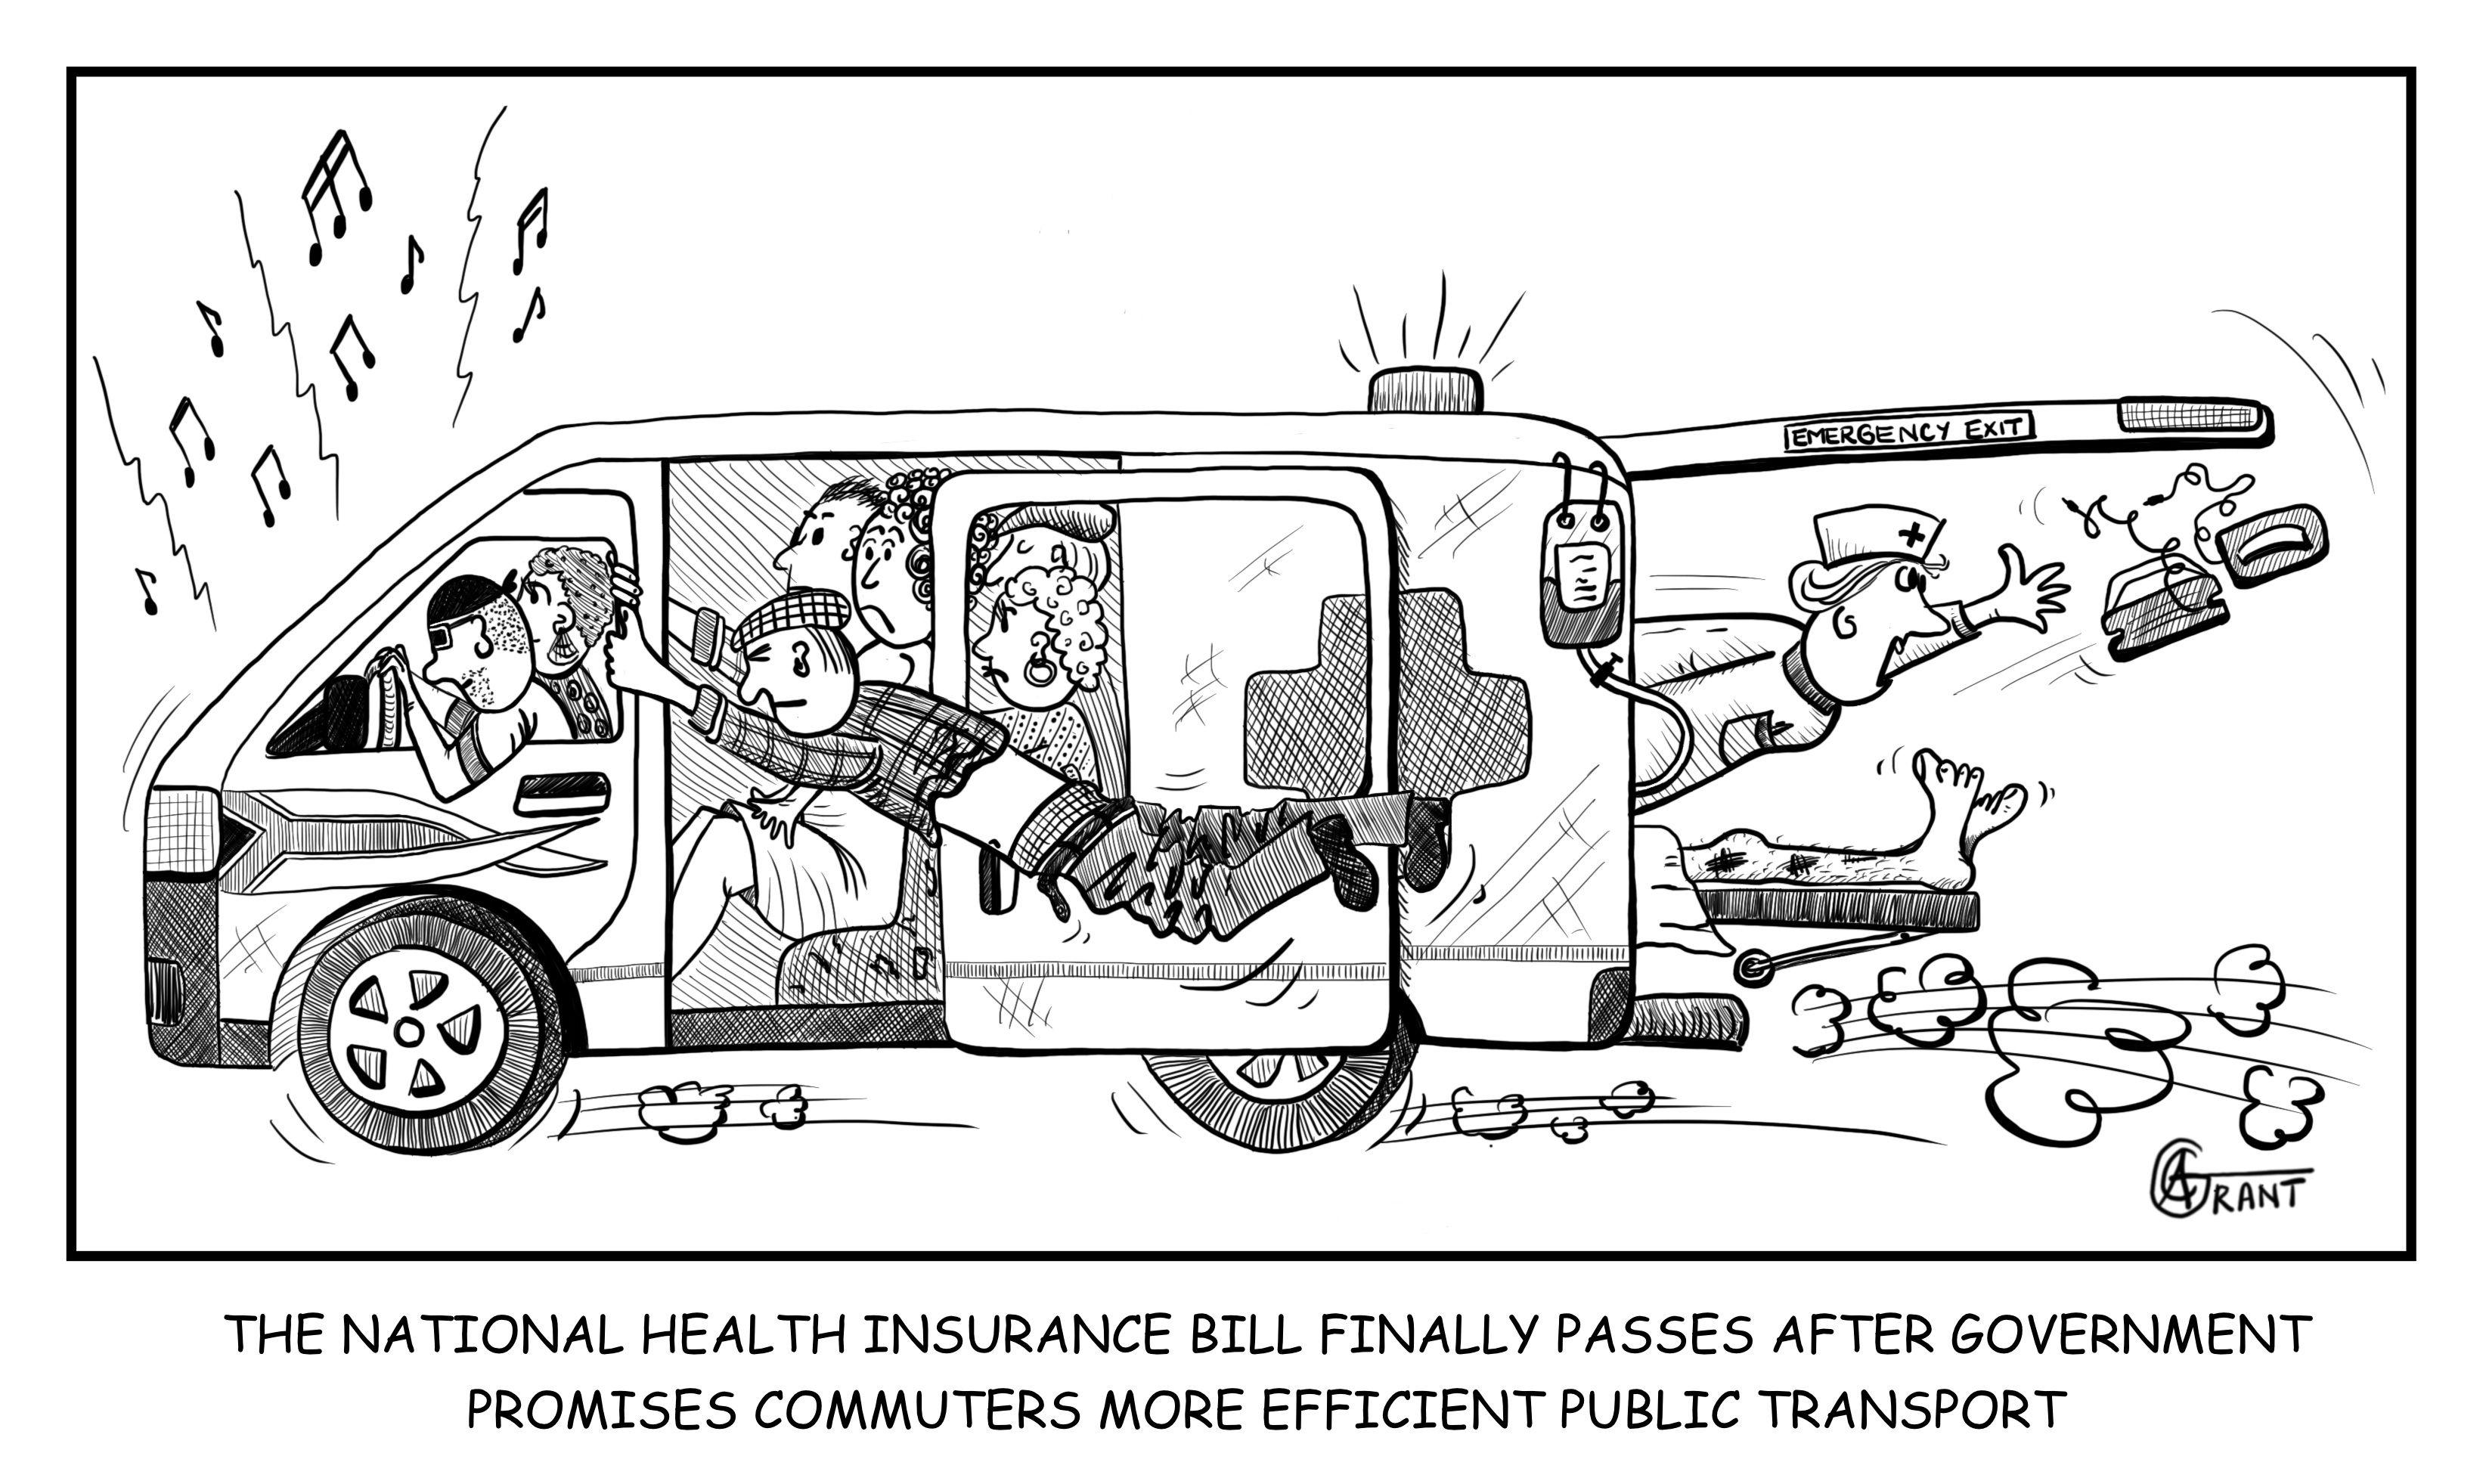 My satirical take on the National Health Insurance Bill.